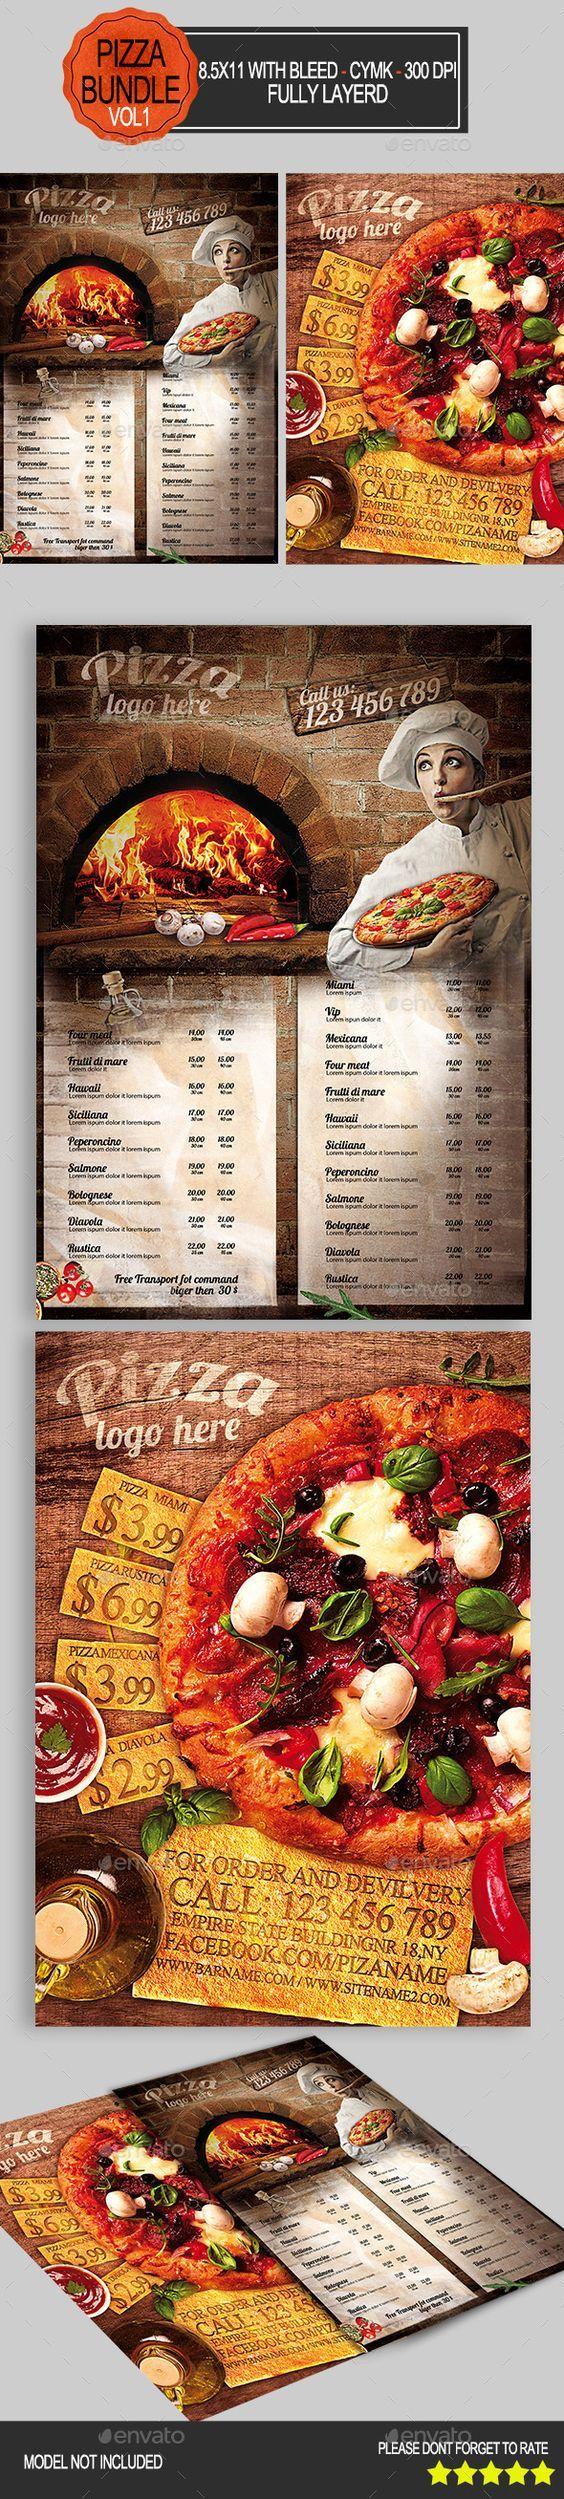 Pizza Flyer Bundle Template #design Download: http://graphicriver.net/item/pizza-flyer-bundle-vol1-/9342636?ref=ksioks: